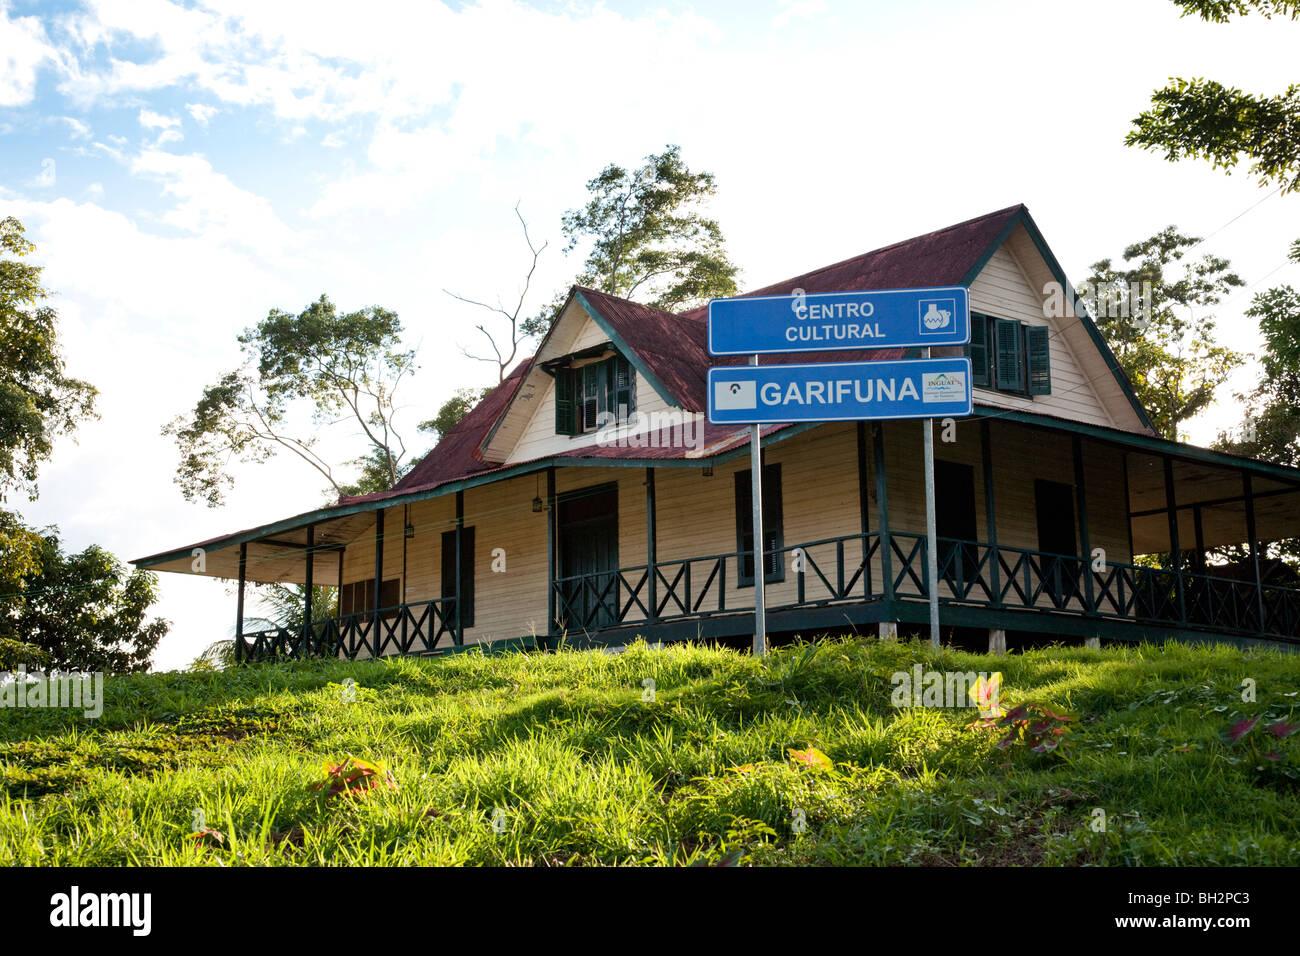 Centro Cultural Garifuna, Livingston, Guatemala. - Stock Image